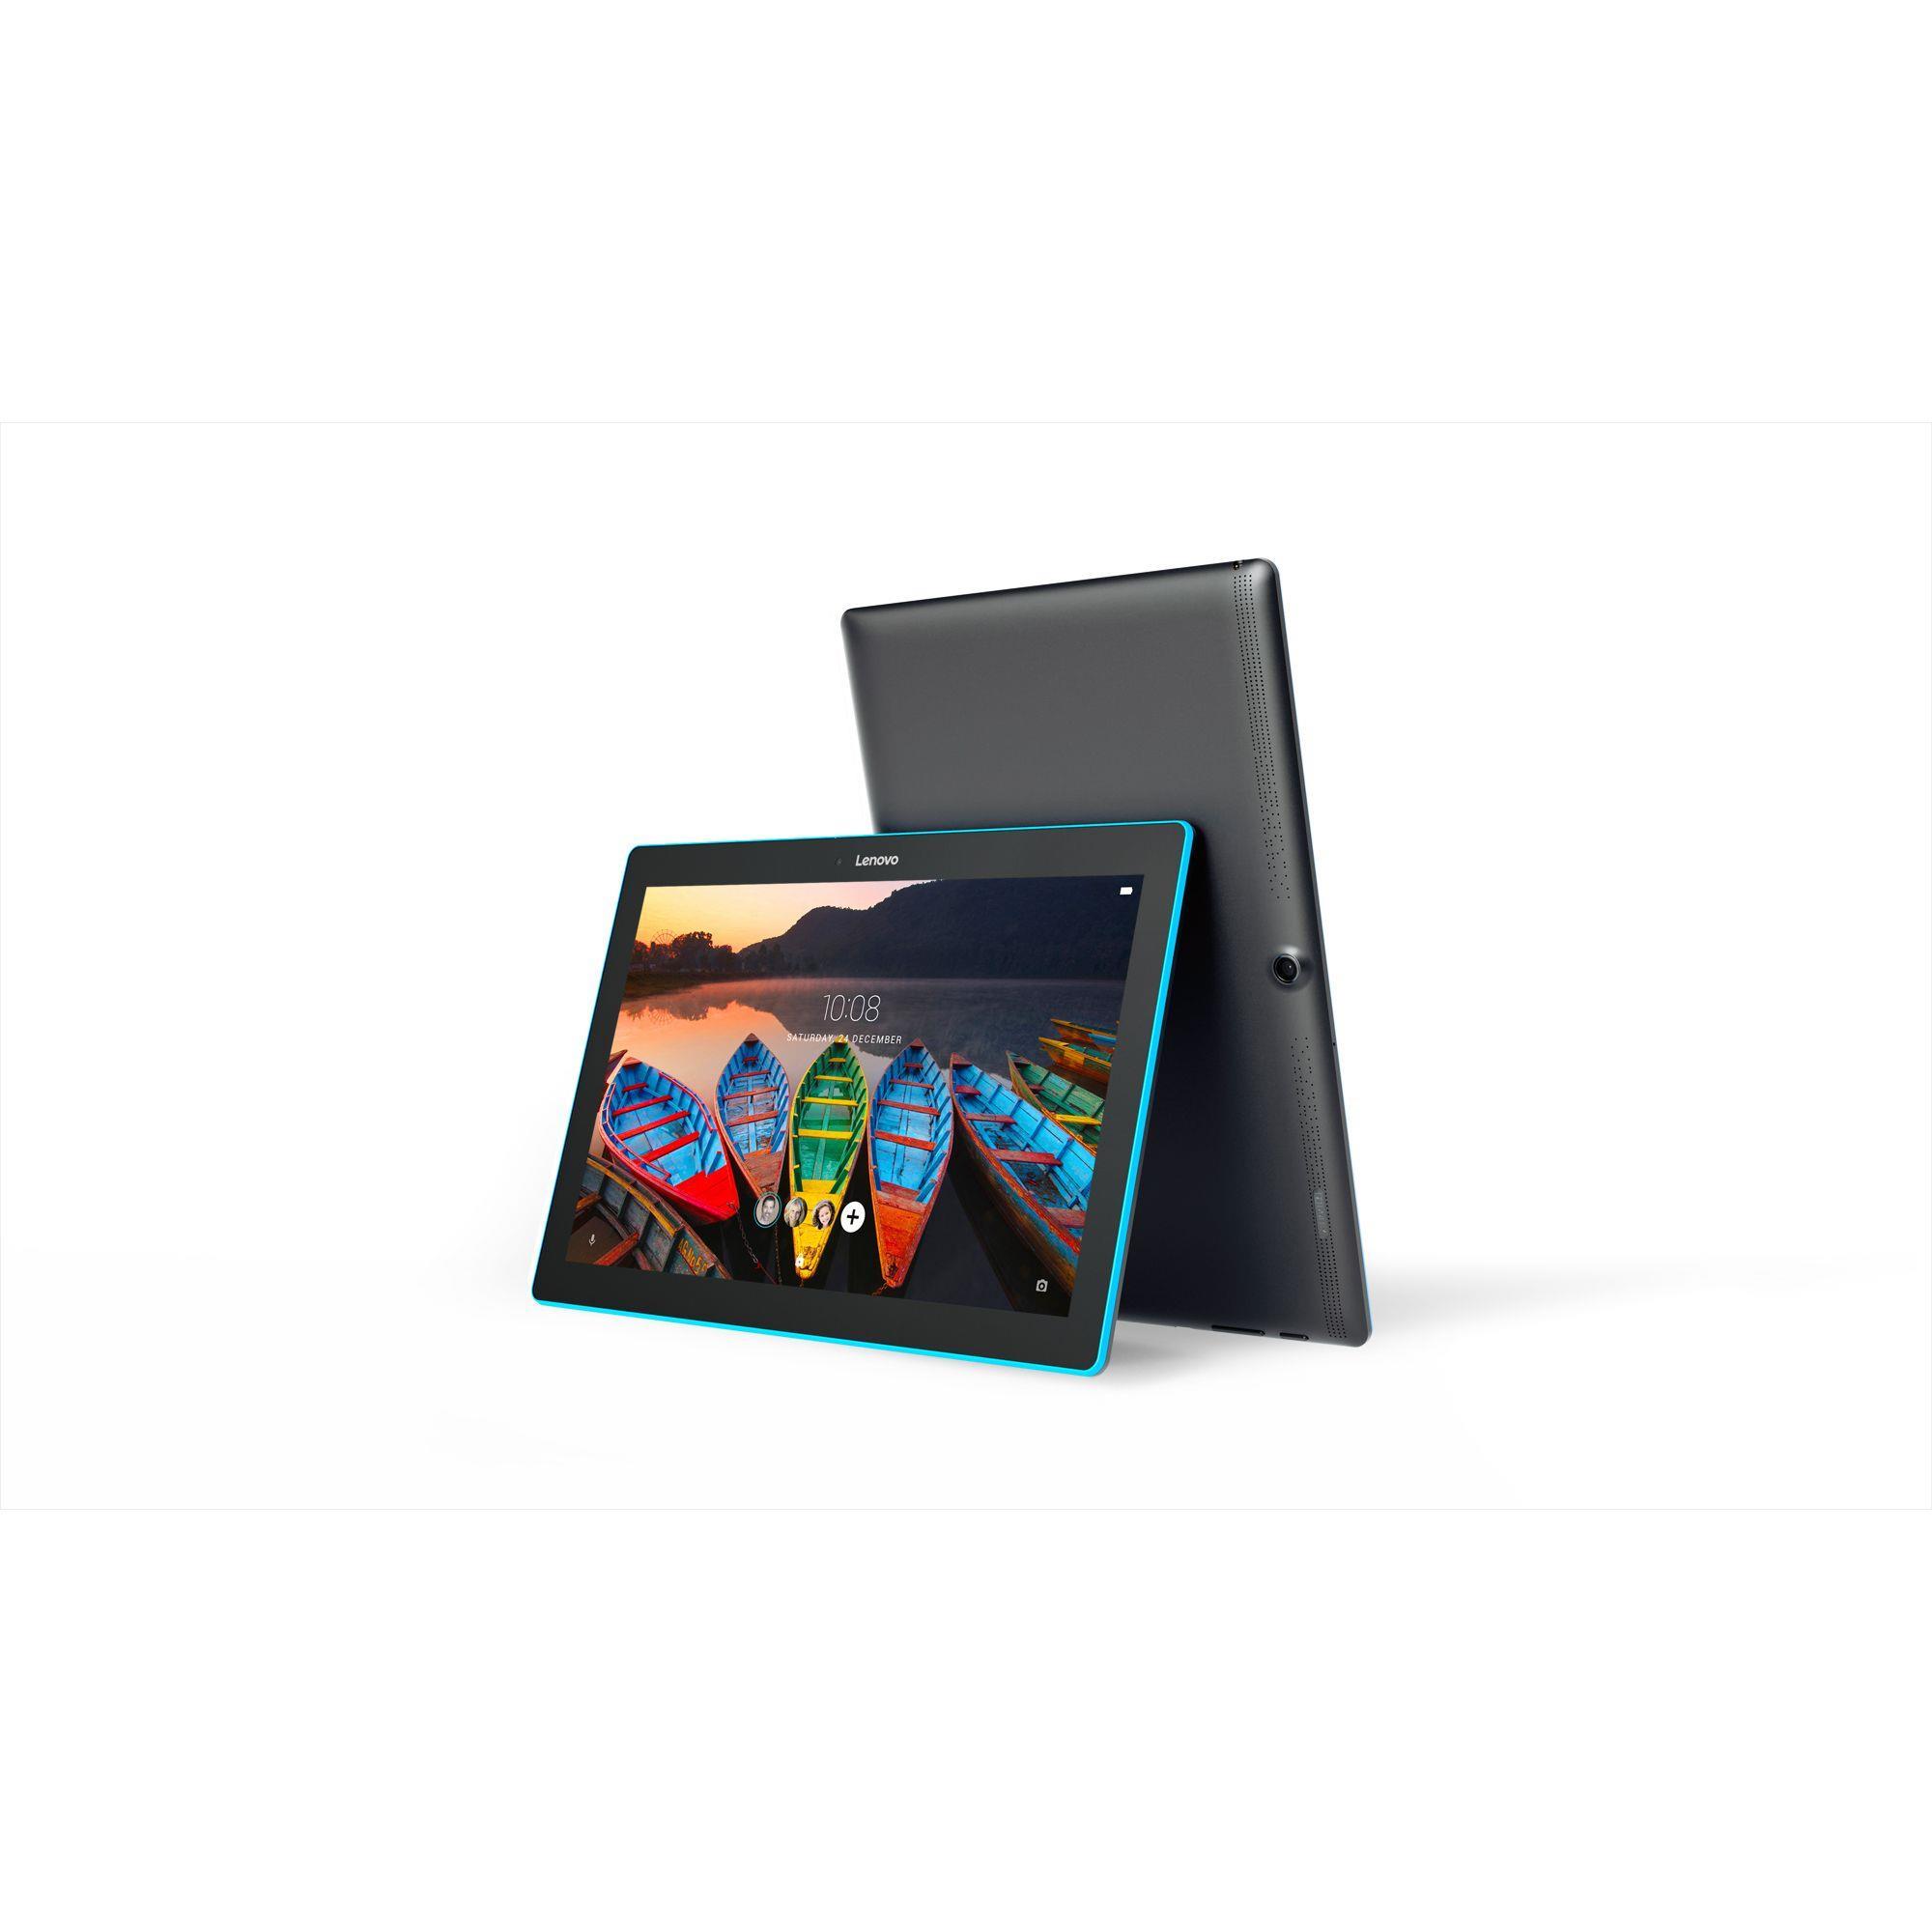 Tablet Lenovo TAB4 10 TB-X103F 10.1 cal  MT8732 1GB 16GB GPS Andr.7.0 Black (1)